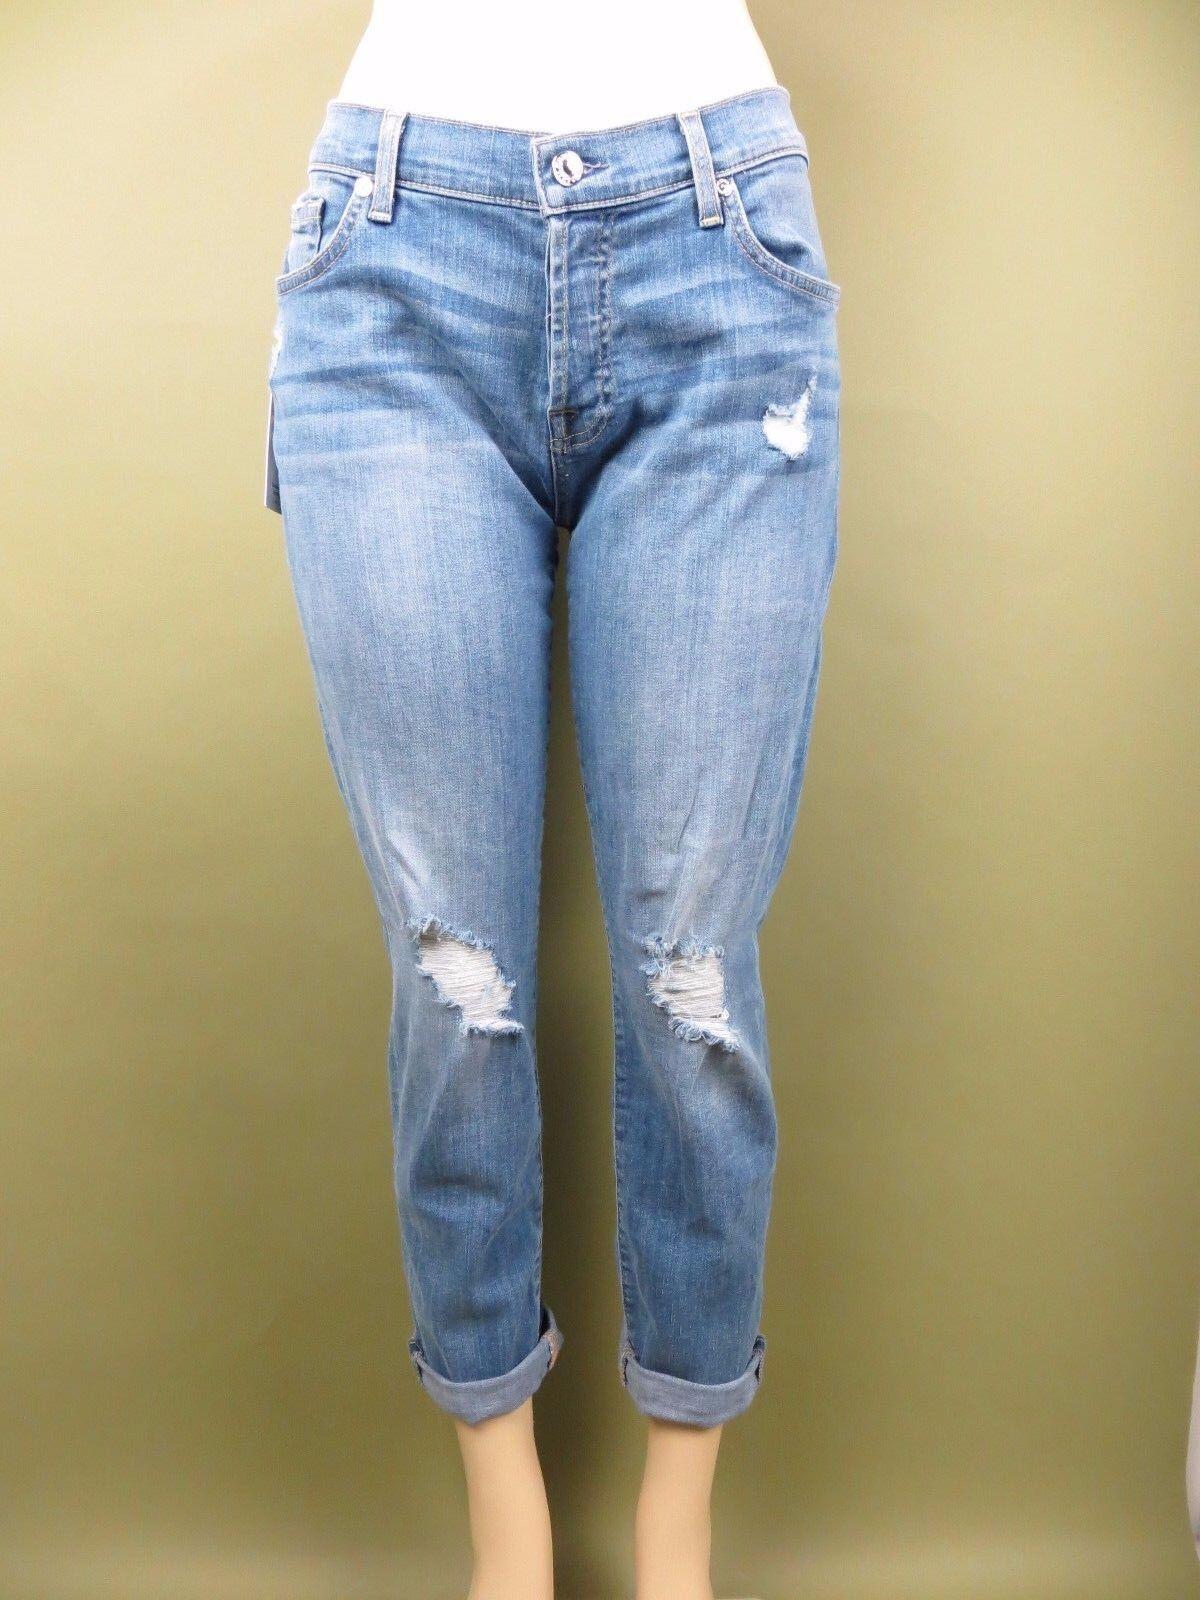 Nuevo con etiquetas 7 Seven for all mankind jeans Josefina  femenino novio, LKP2, Talla 29, 229    Mejor precio